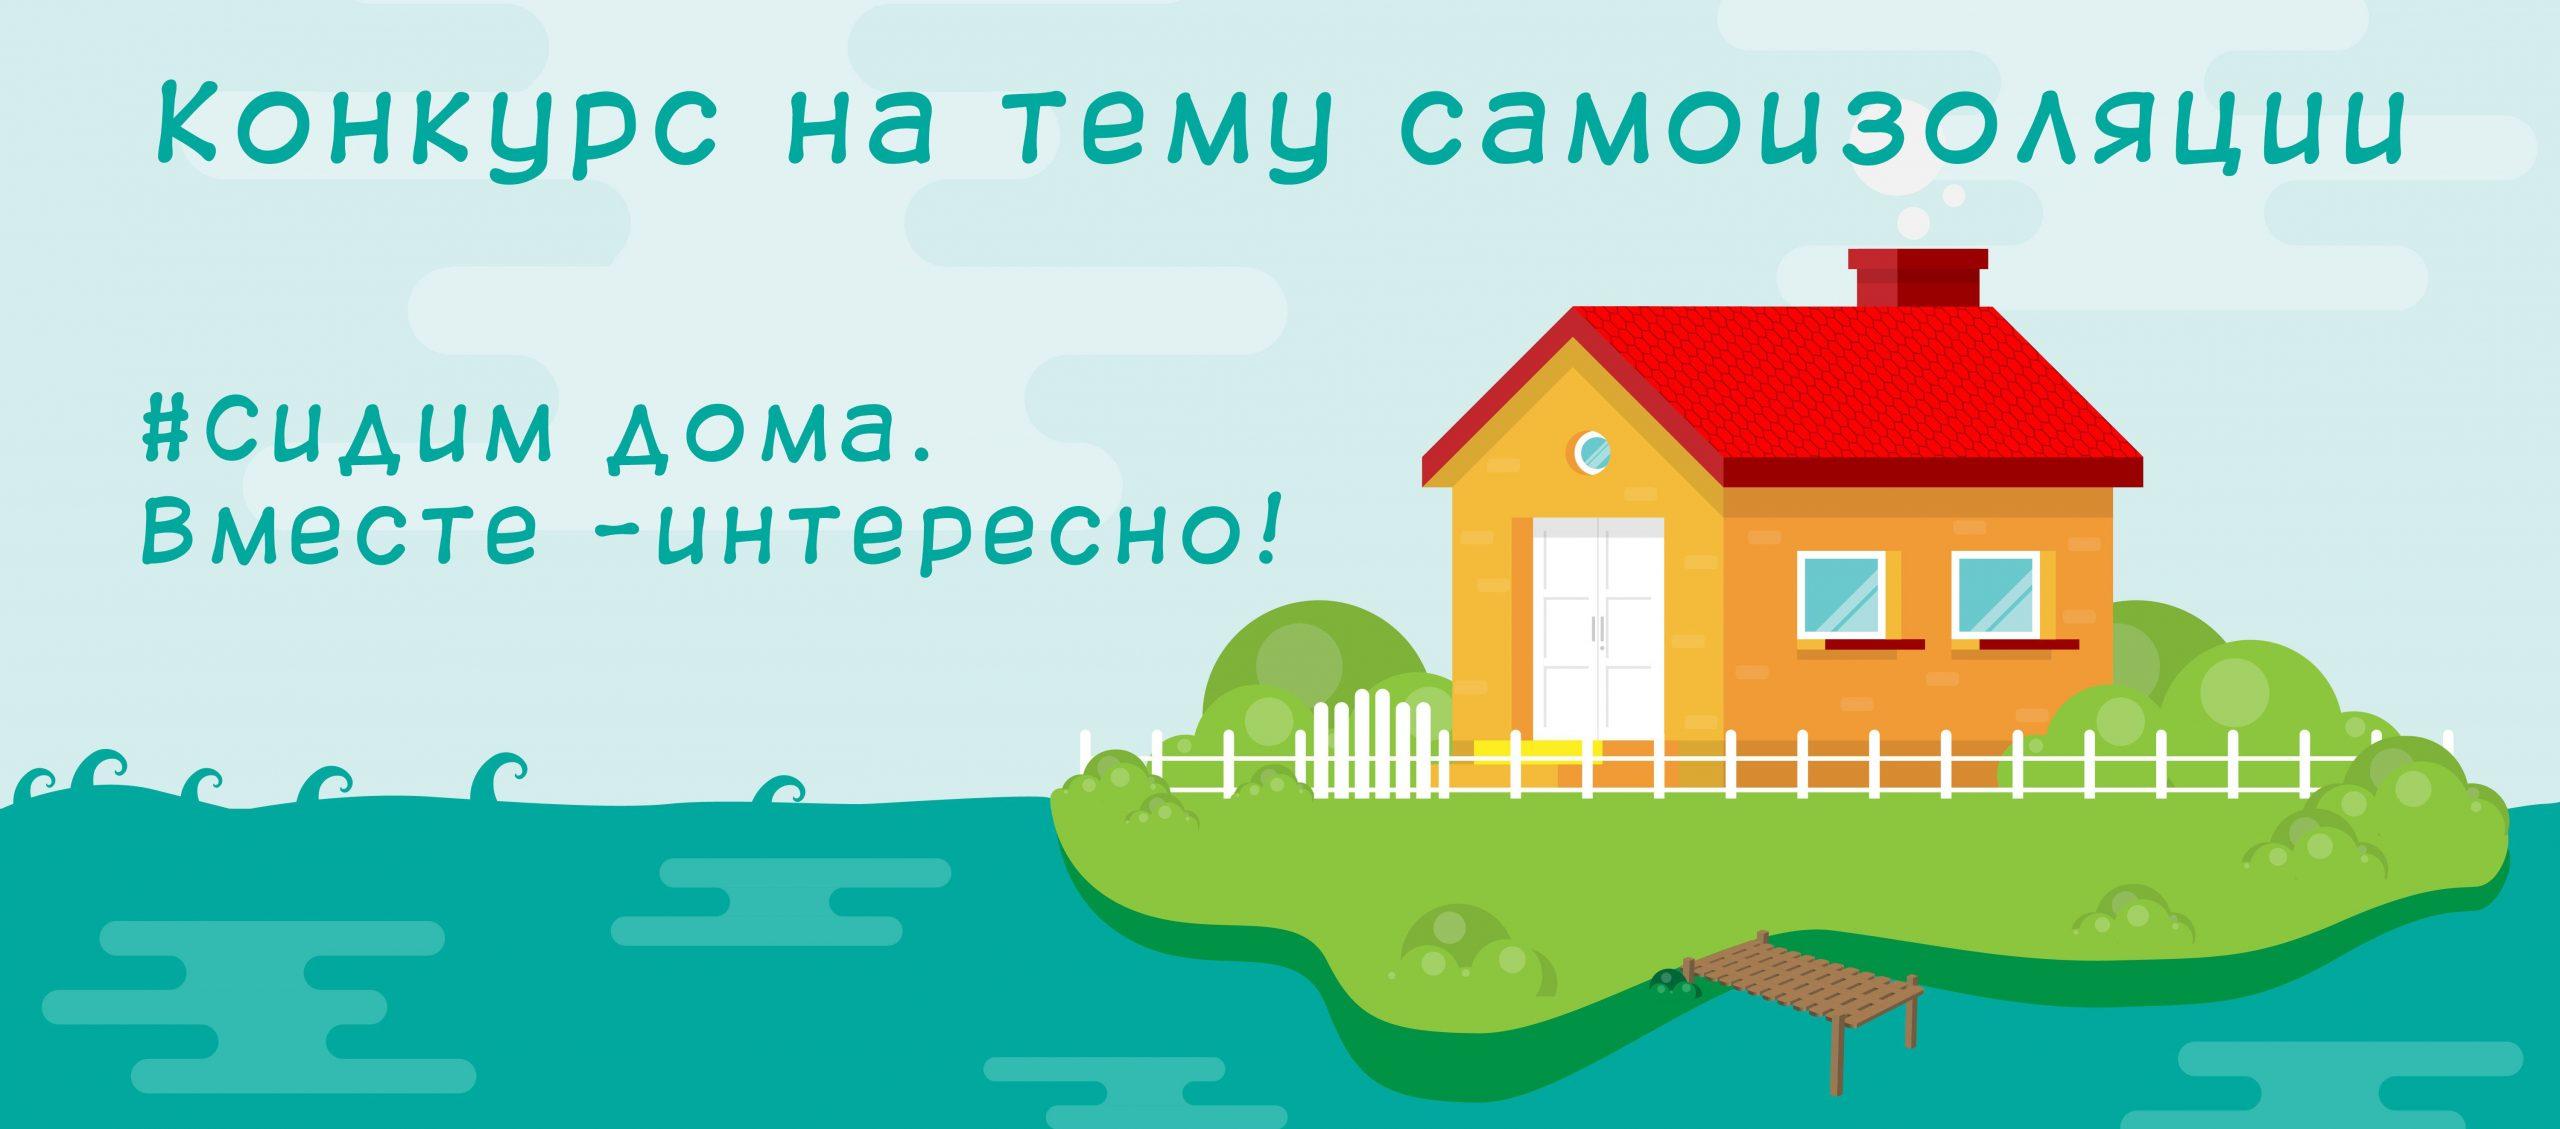 Конкурс на тему самоизоляции «#Сидим дома. Вместе –интересно!»